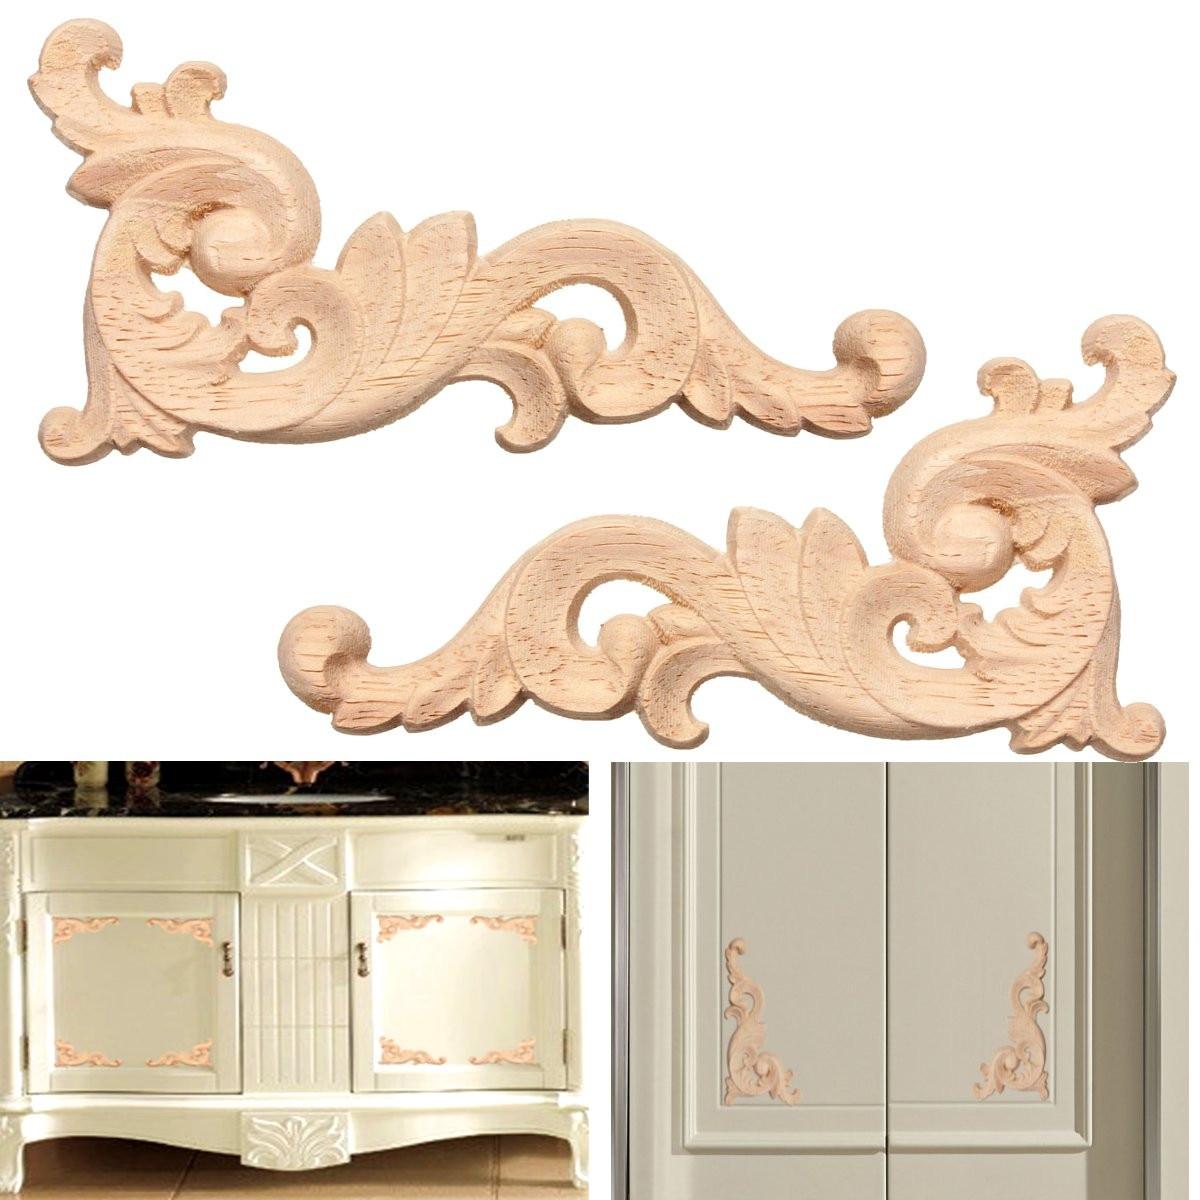 Vintage 1pc Woodcarving Decal Wood Carved Corner Applique Frame Door Decor Wall Doors Furniture Decor Figurines Wooden Miniature